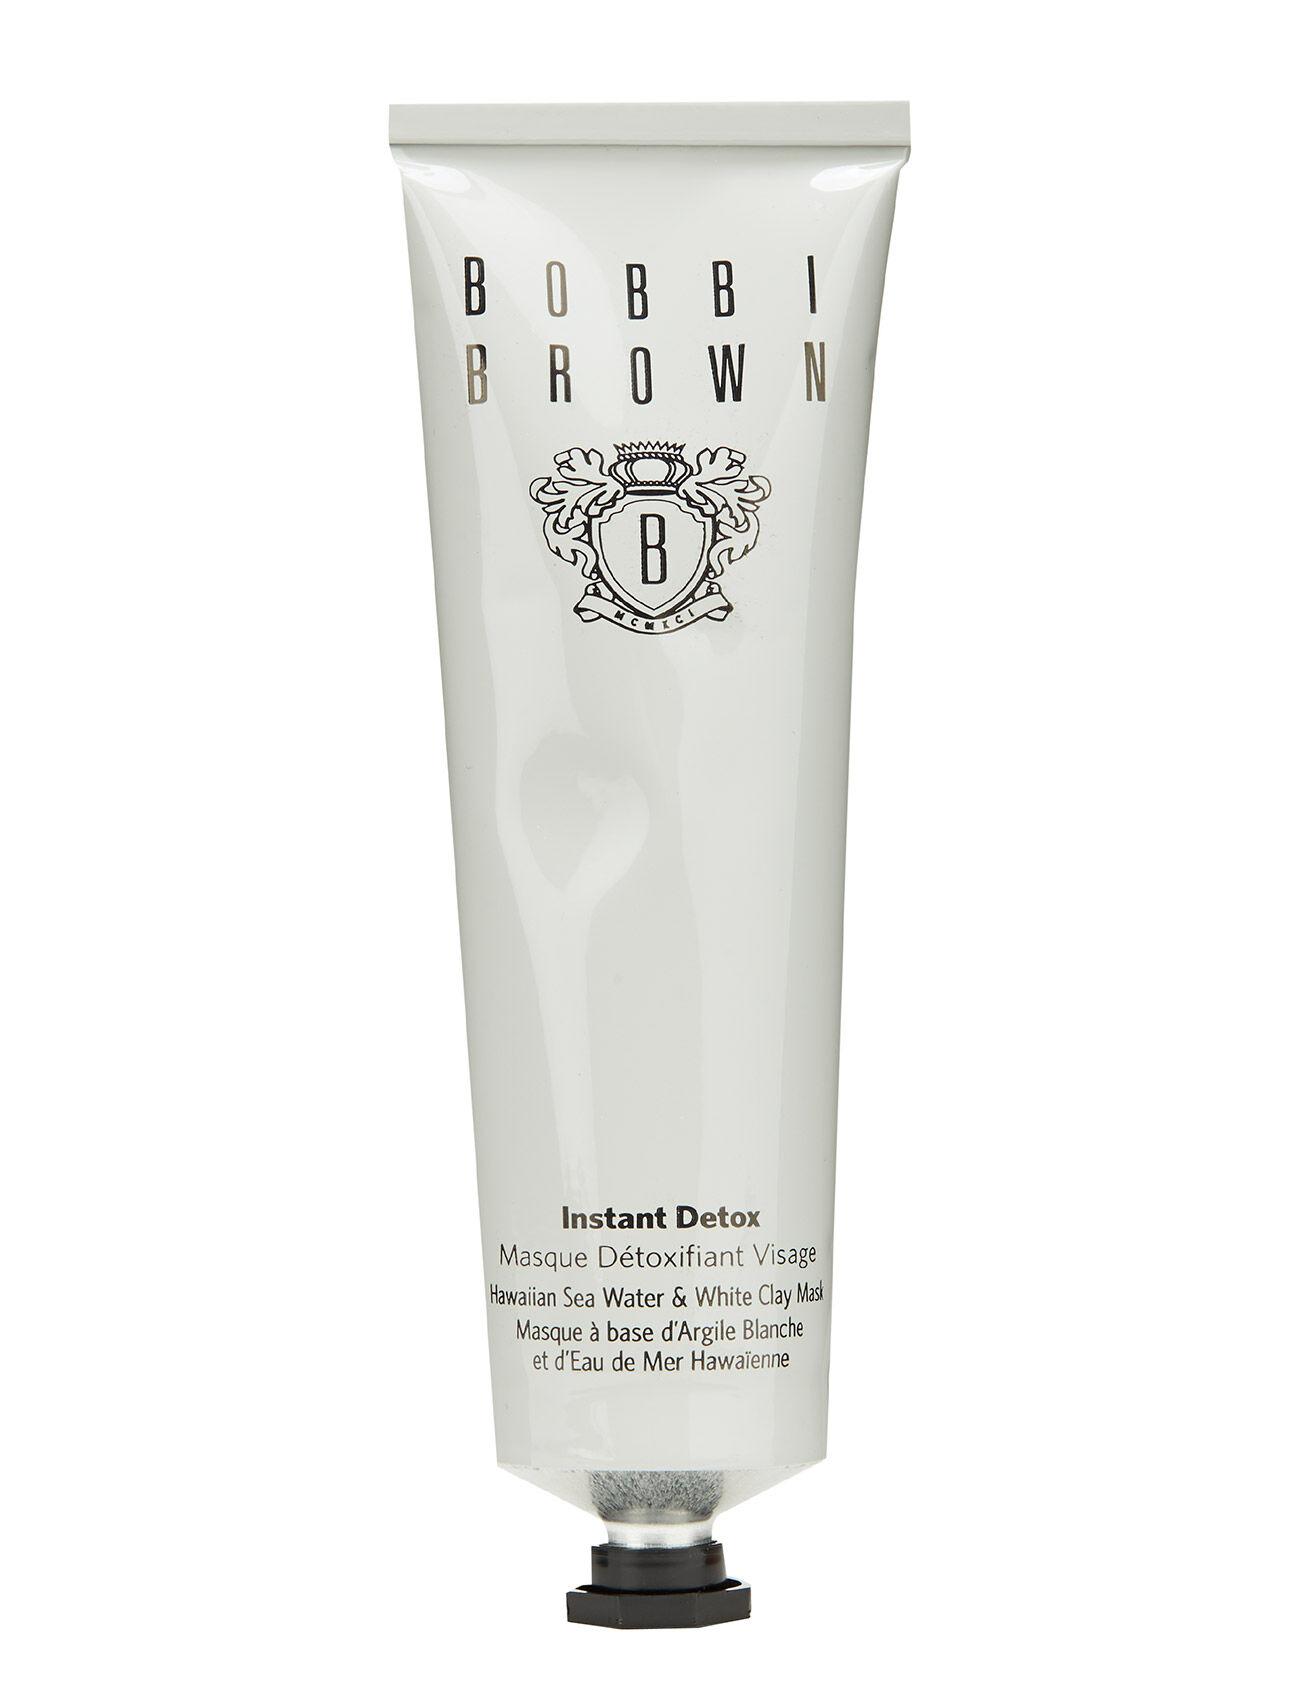 Bobbi Brown Skin Detox: Hawaiian Sea Water & White Clay Mask